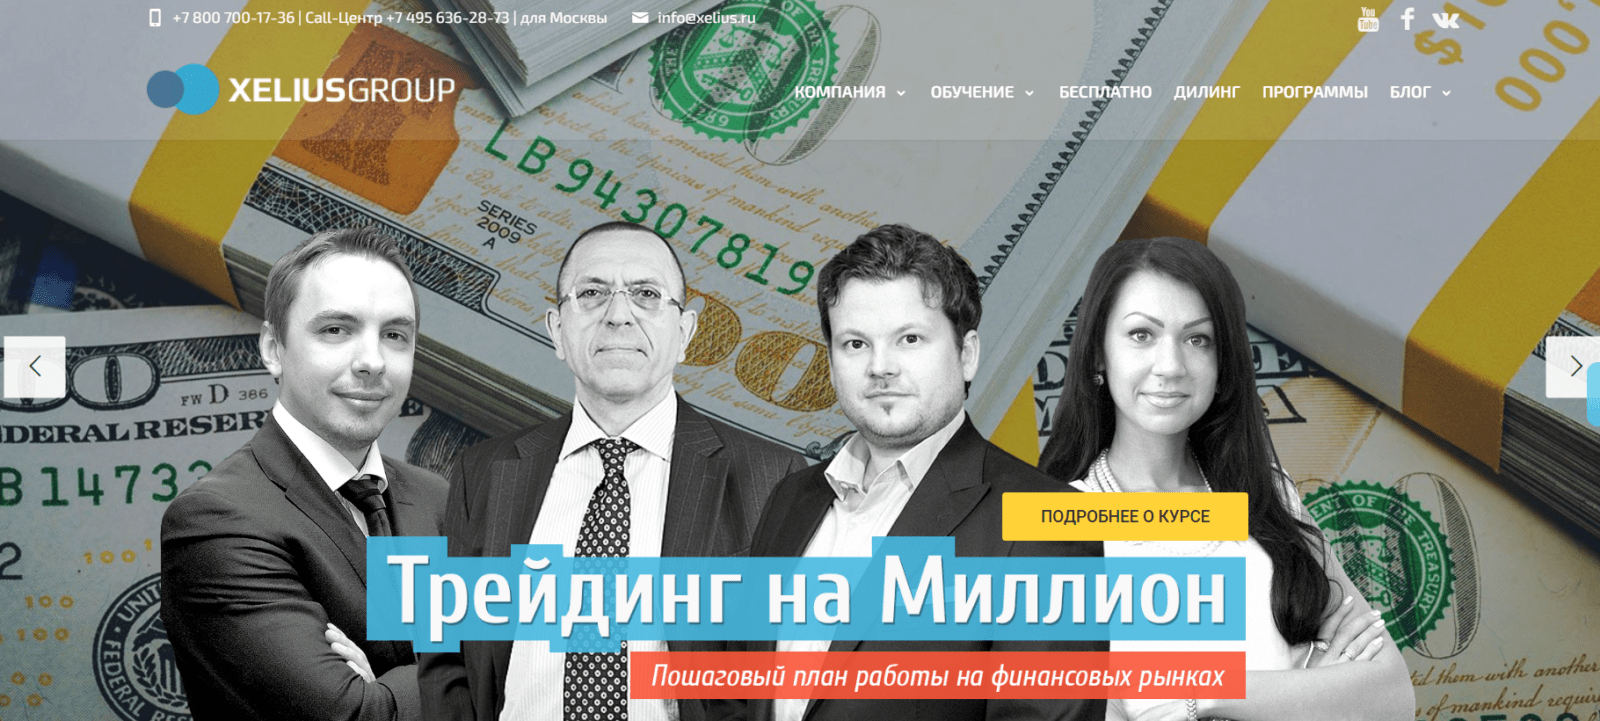 xelius.ru